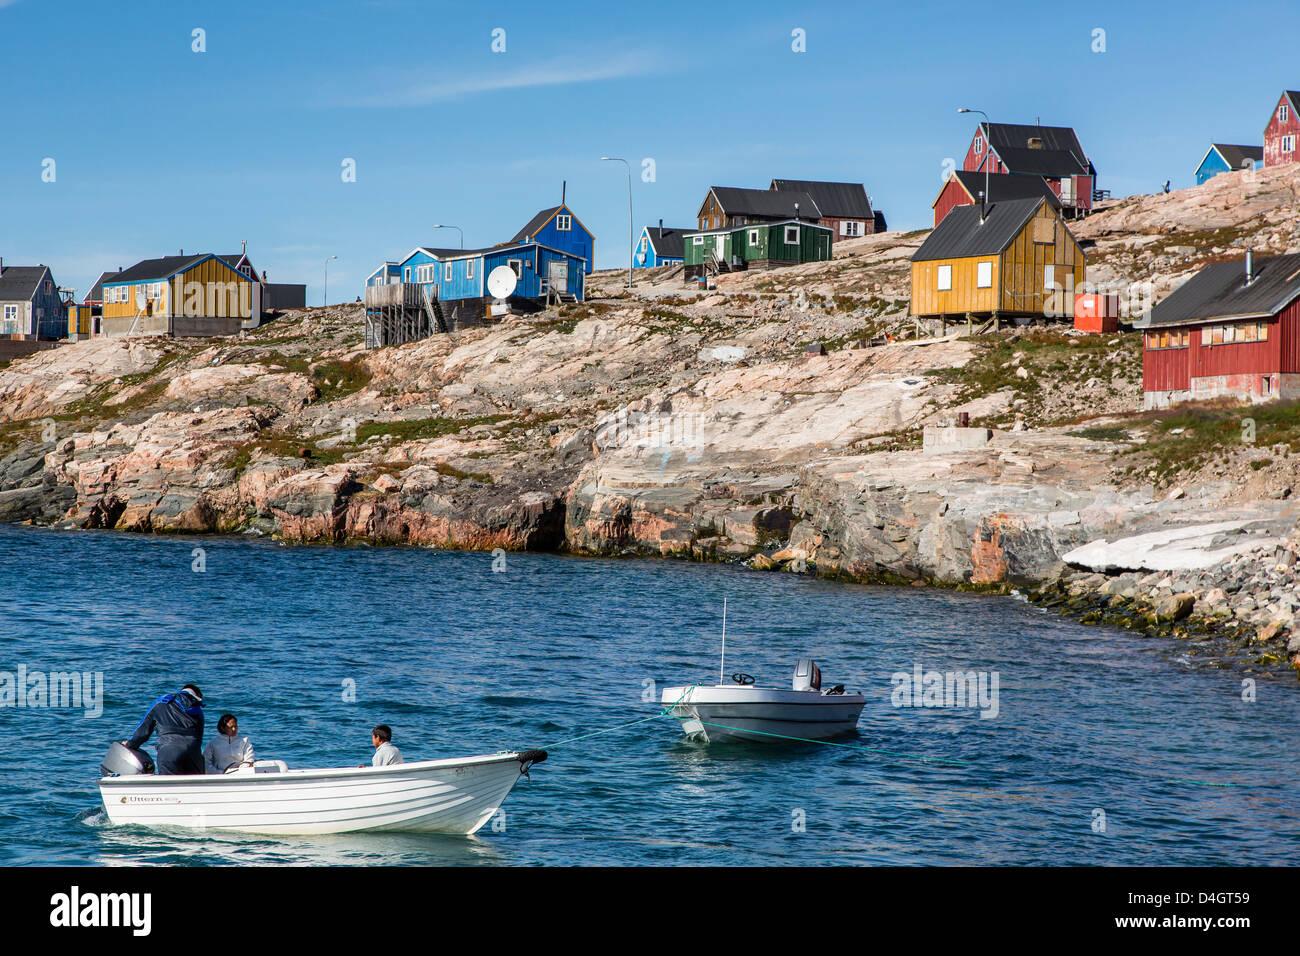 Inuit village, Ittoqqortoormiit, Scoresbysund, Northeast Greenland, Polar Regions - Stock Image